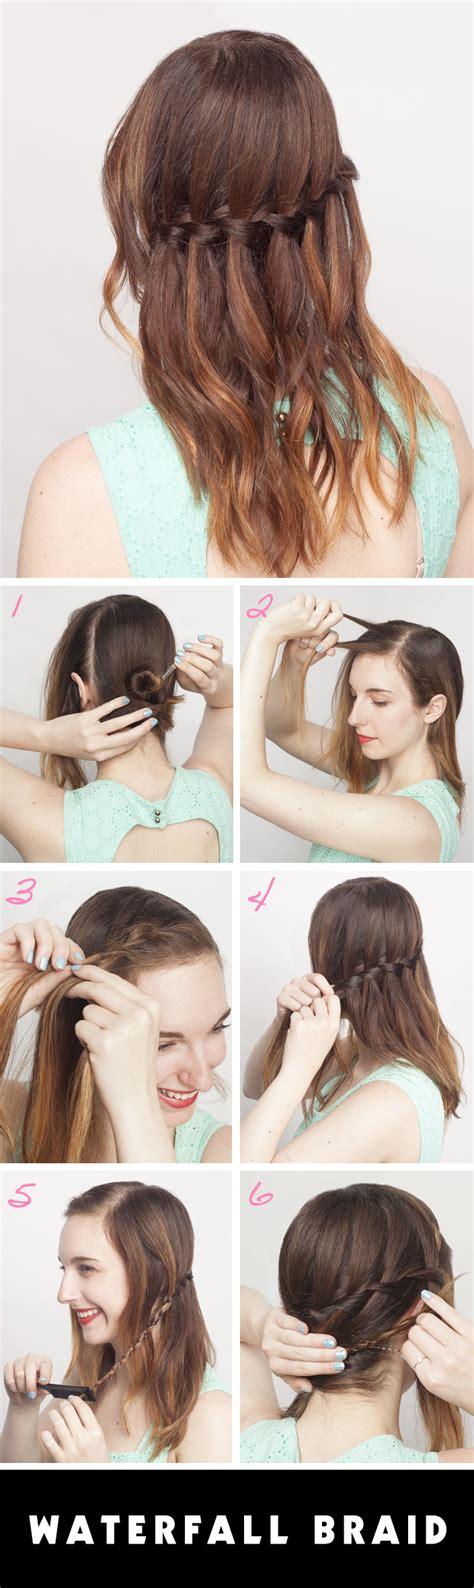 waterfall braid   stylecaster